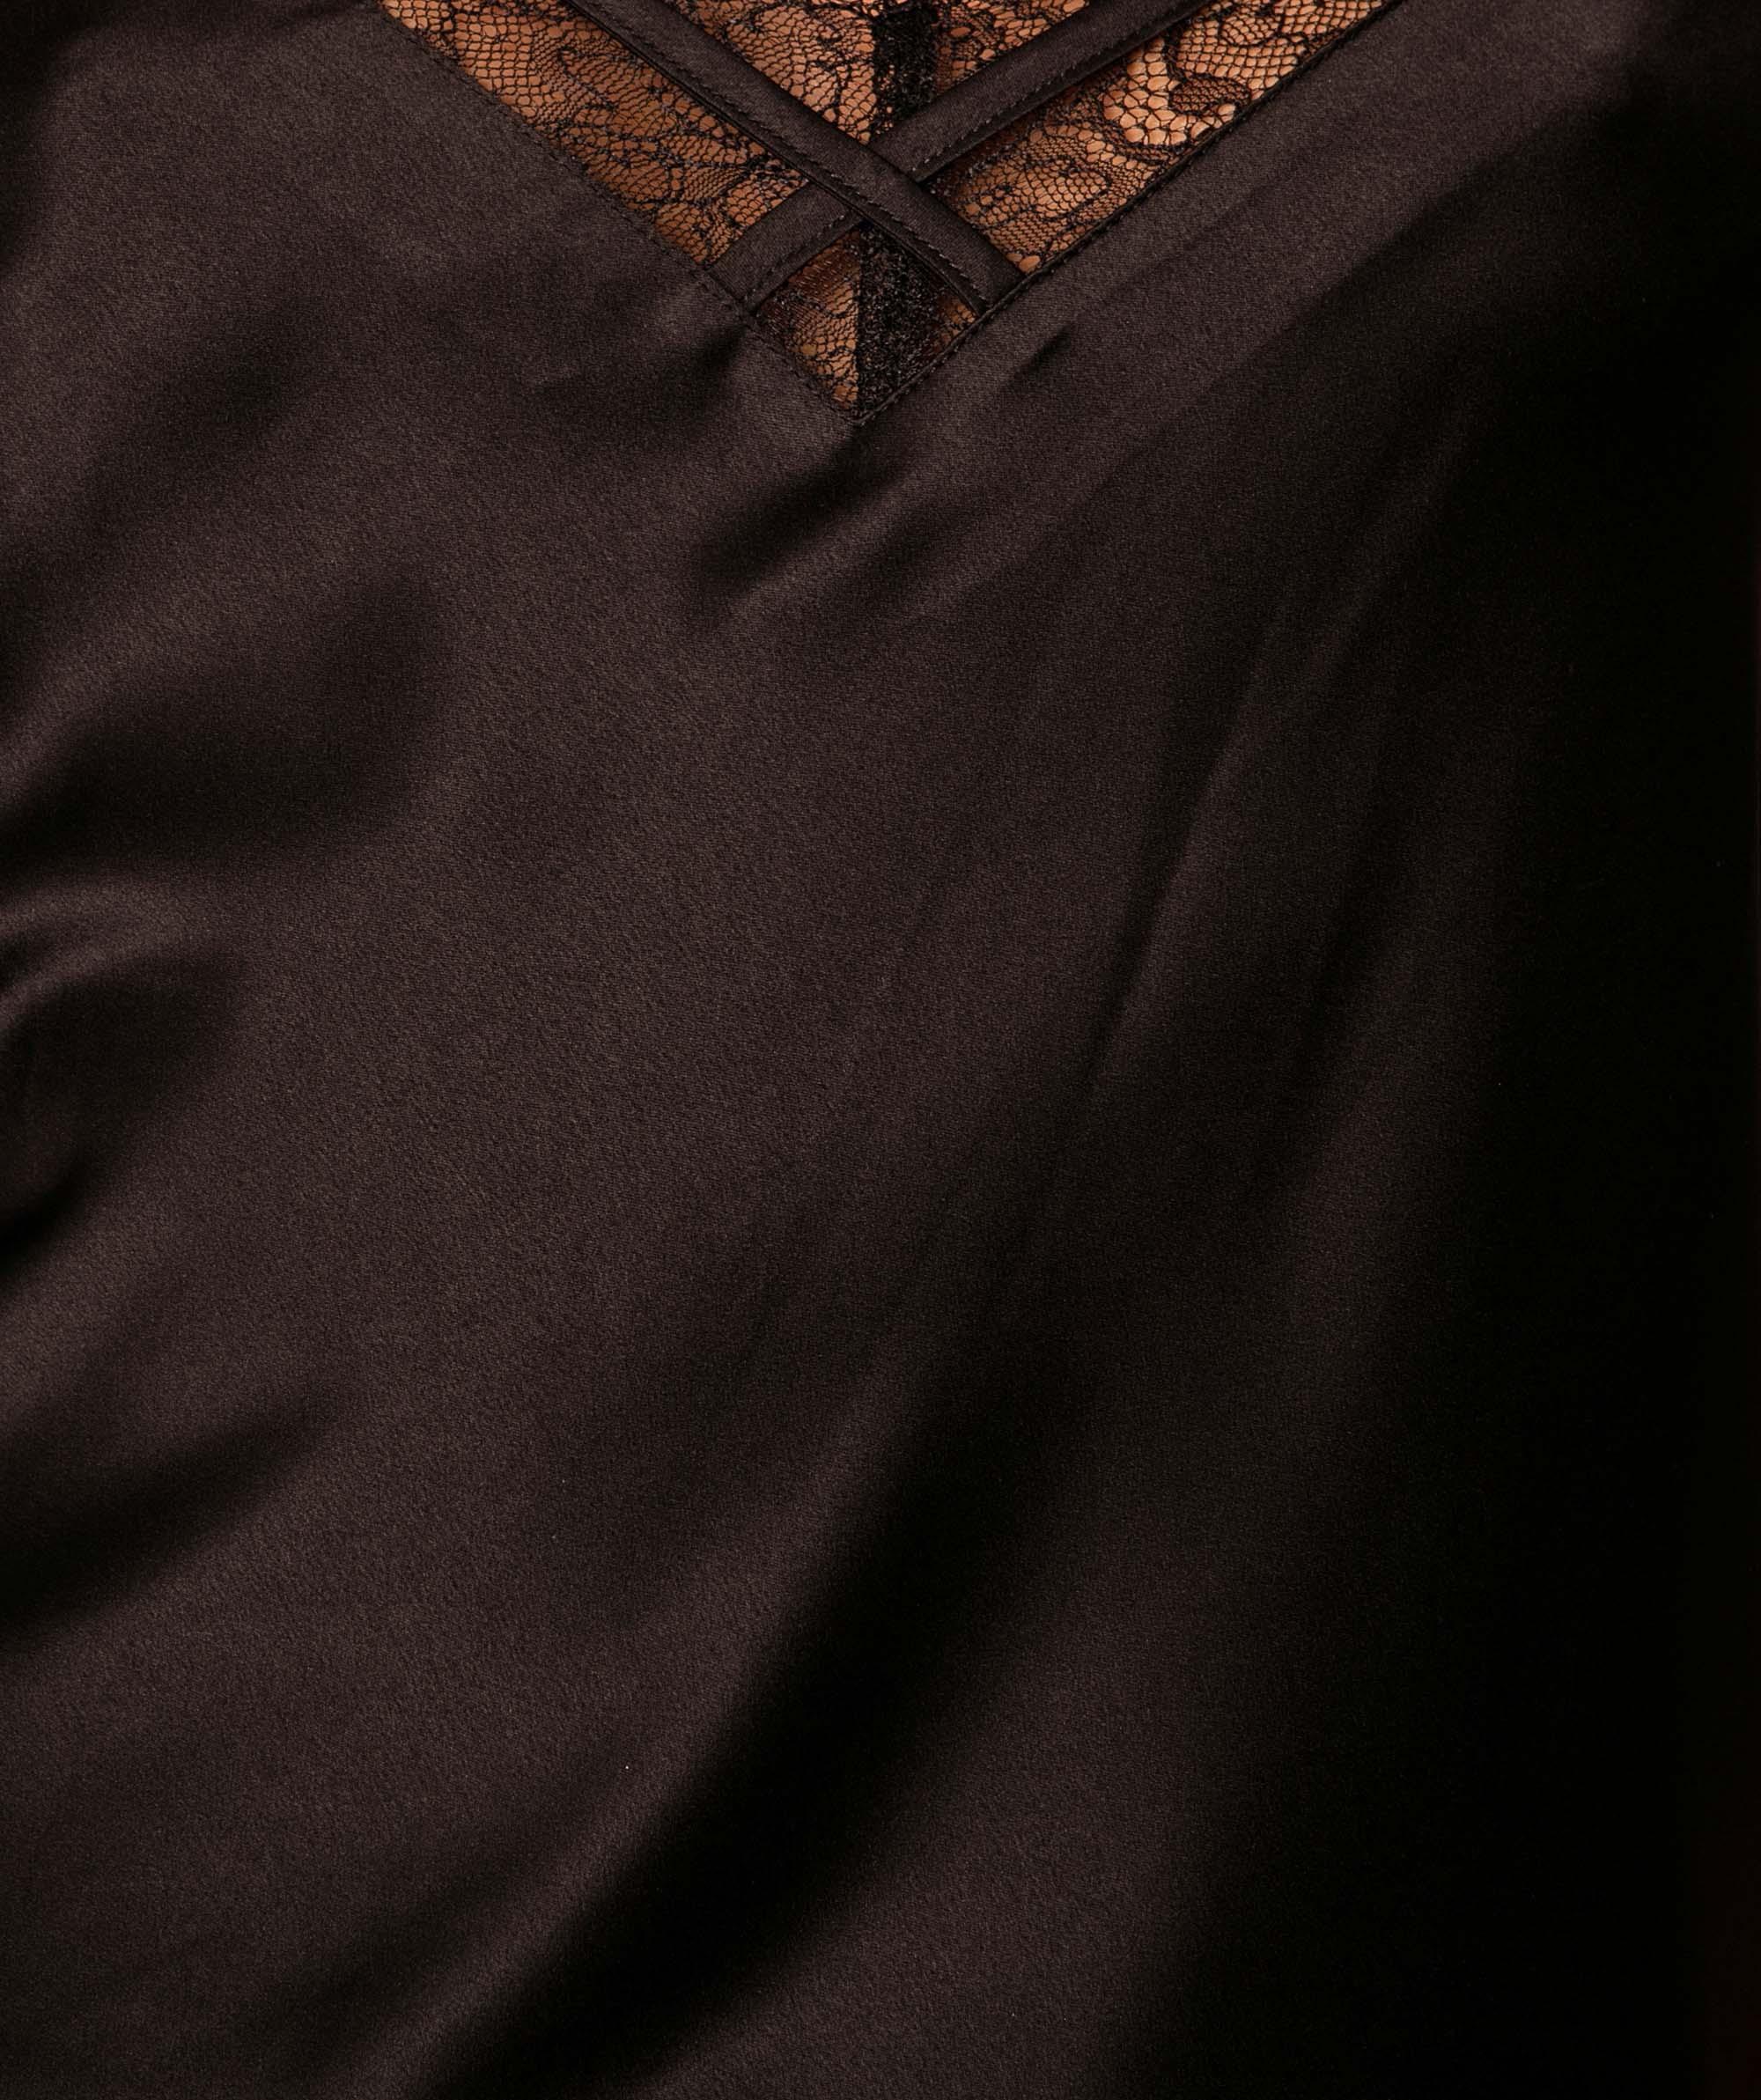 Cosmic Lace Cami - Black